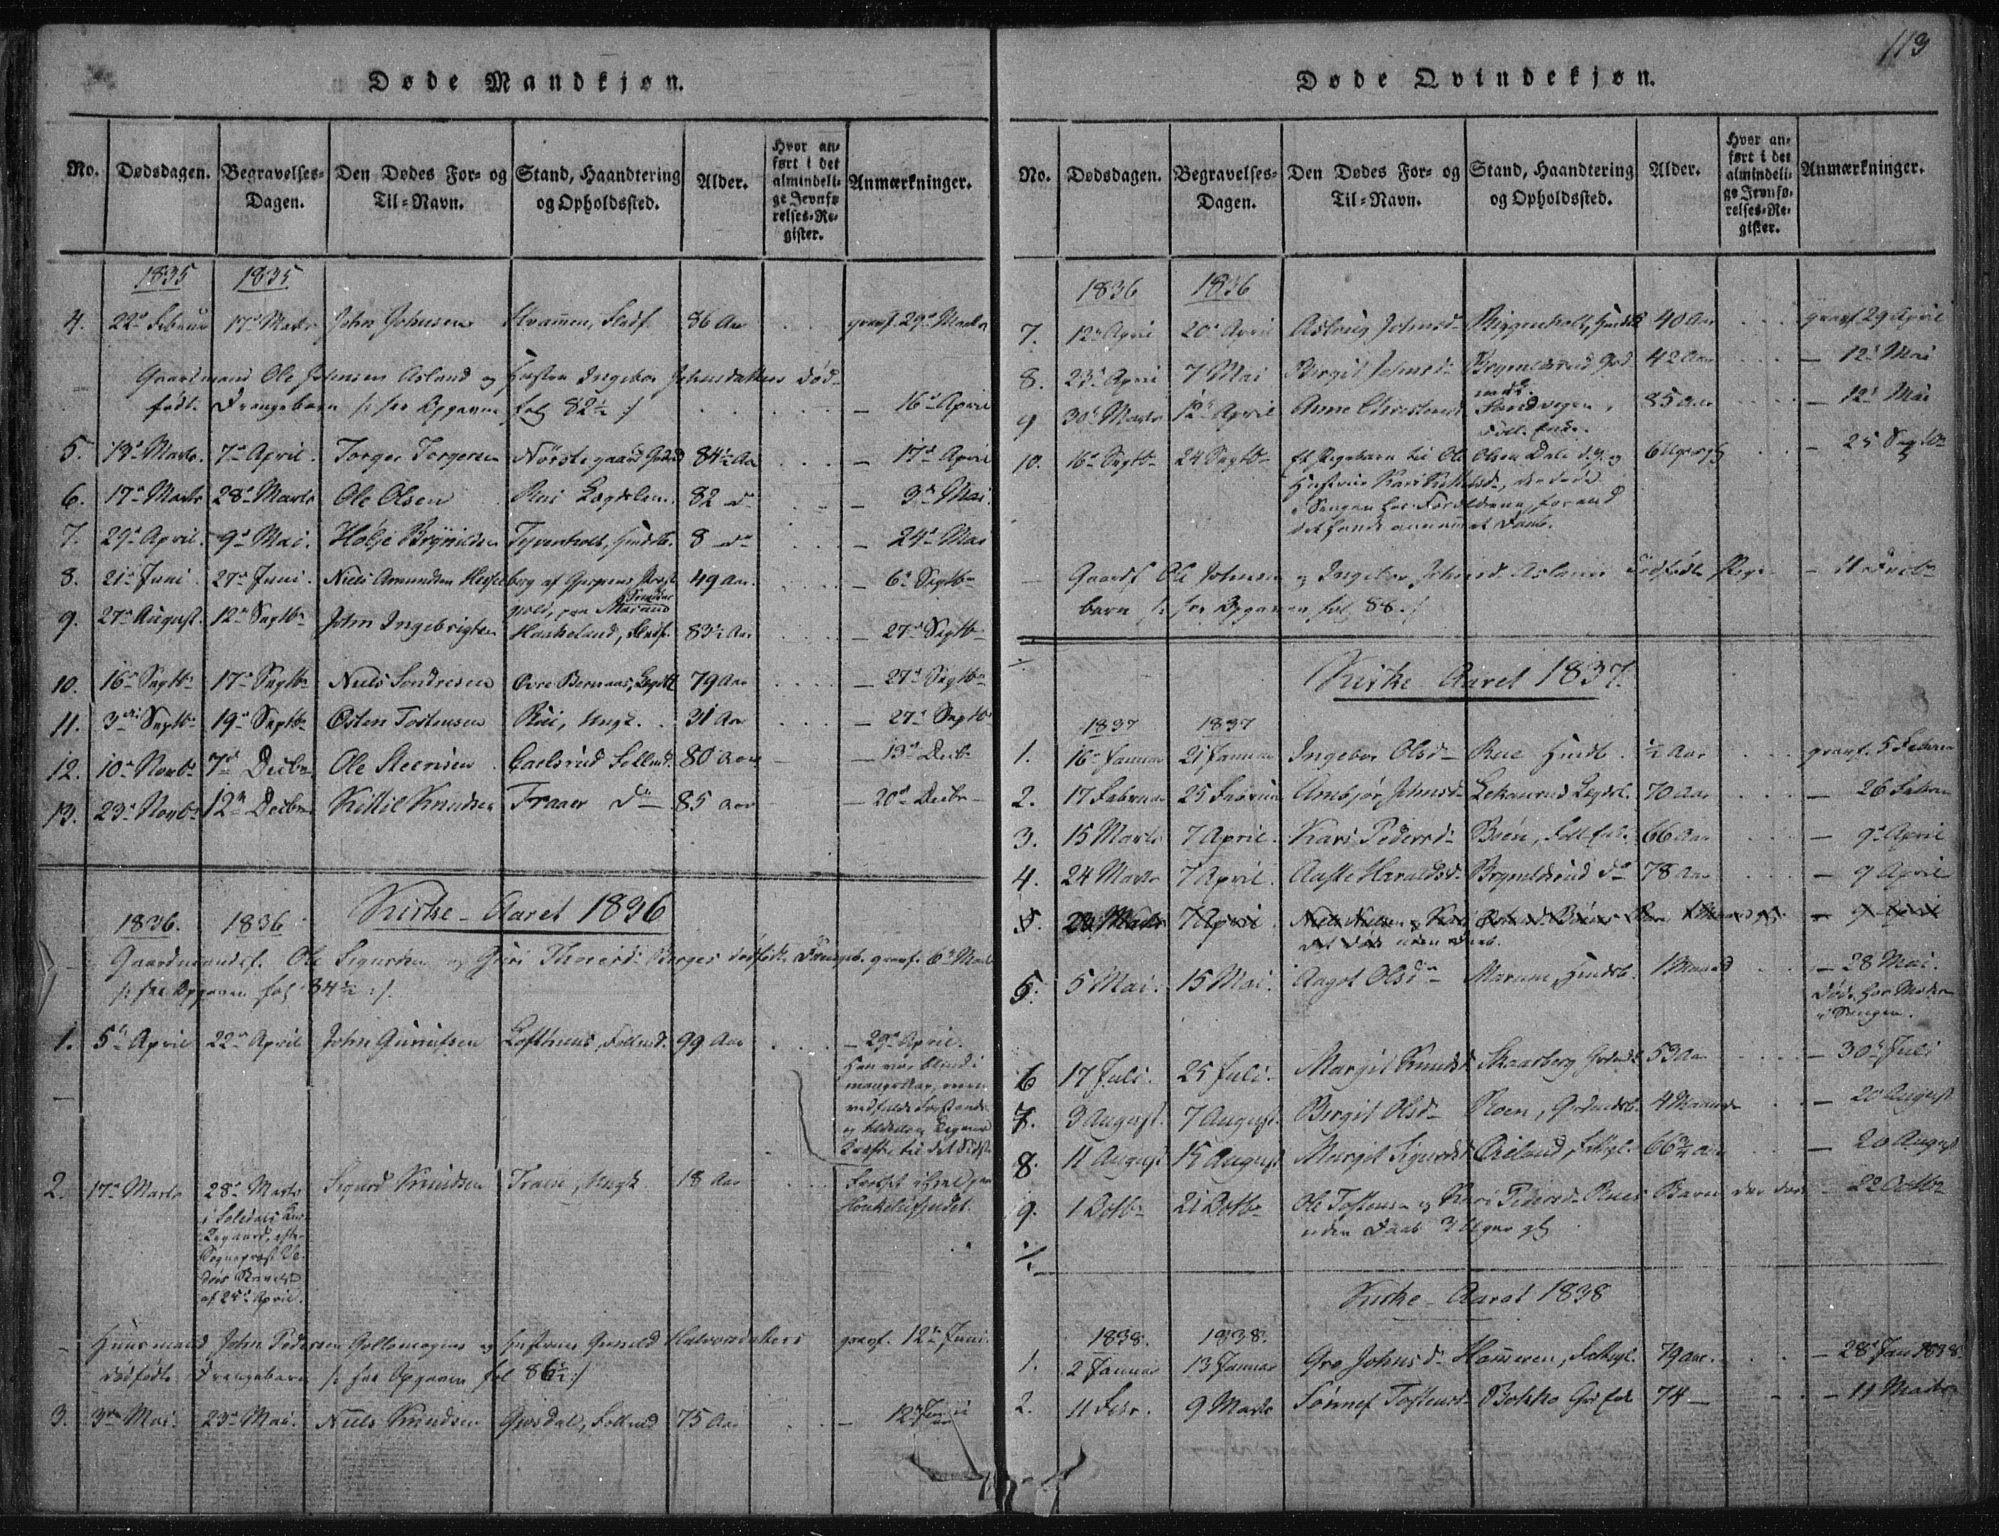 SAKO, Tinn kirkebøker, F/Fa/L0004: Ministerialbok nr. I 4, 1815-1843, s. 113